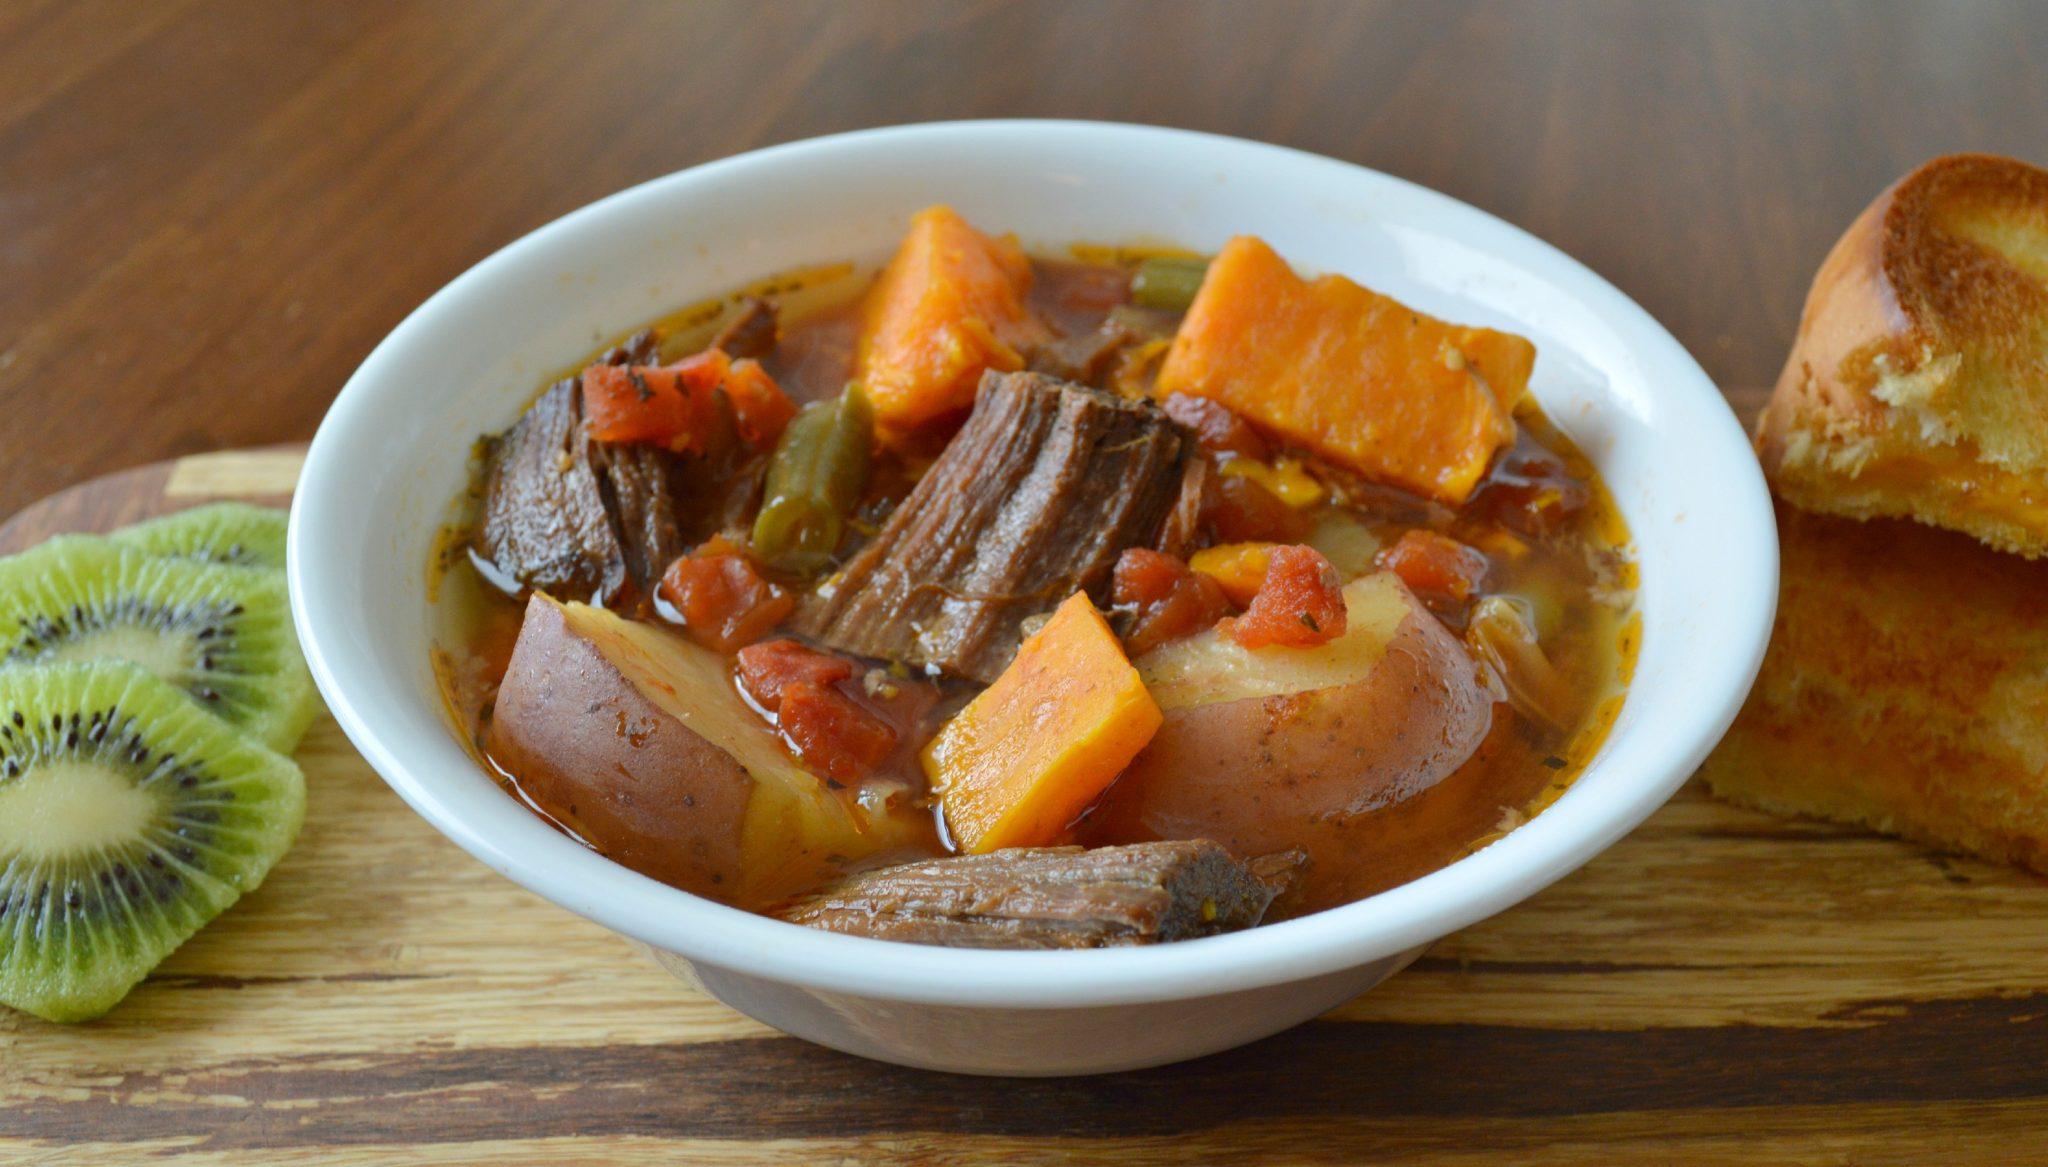 Crockpot Beef and Sweet Potato Stew